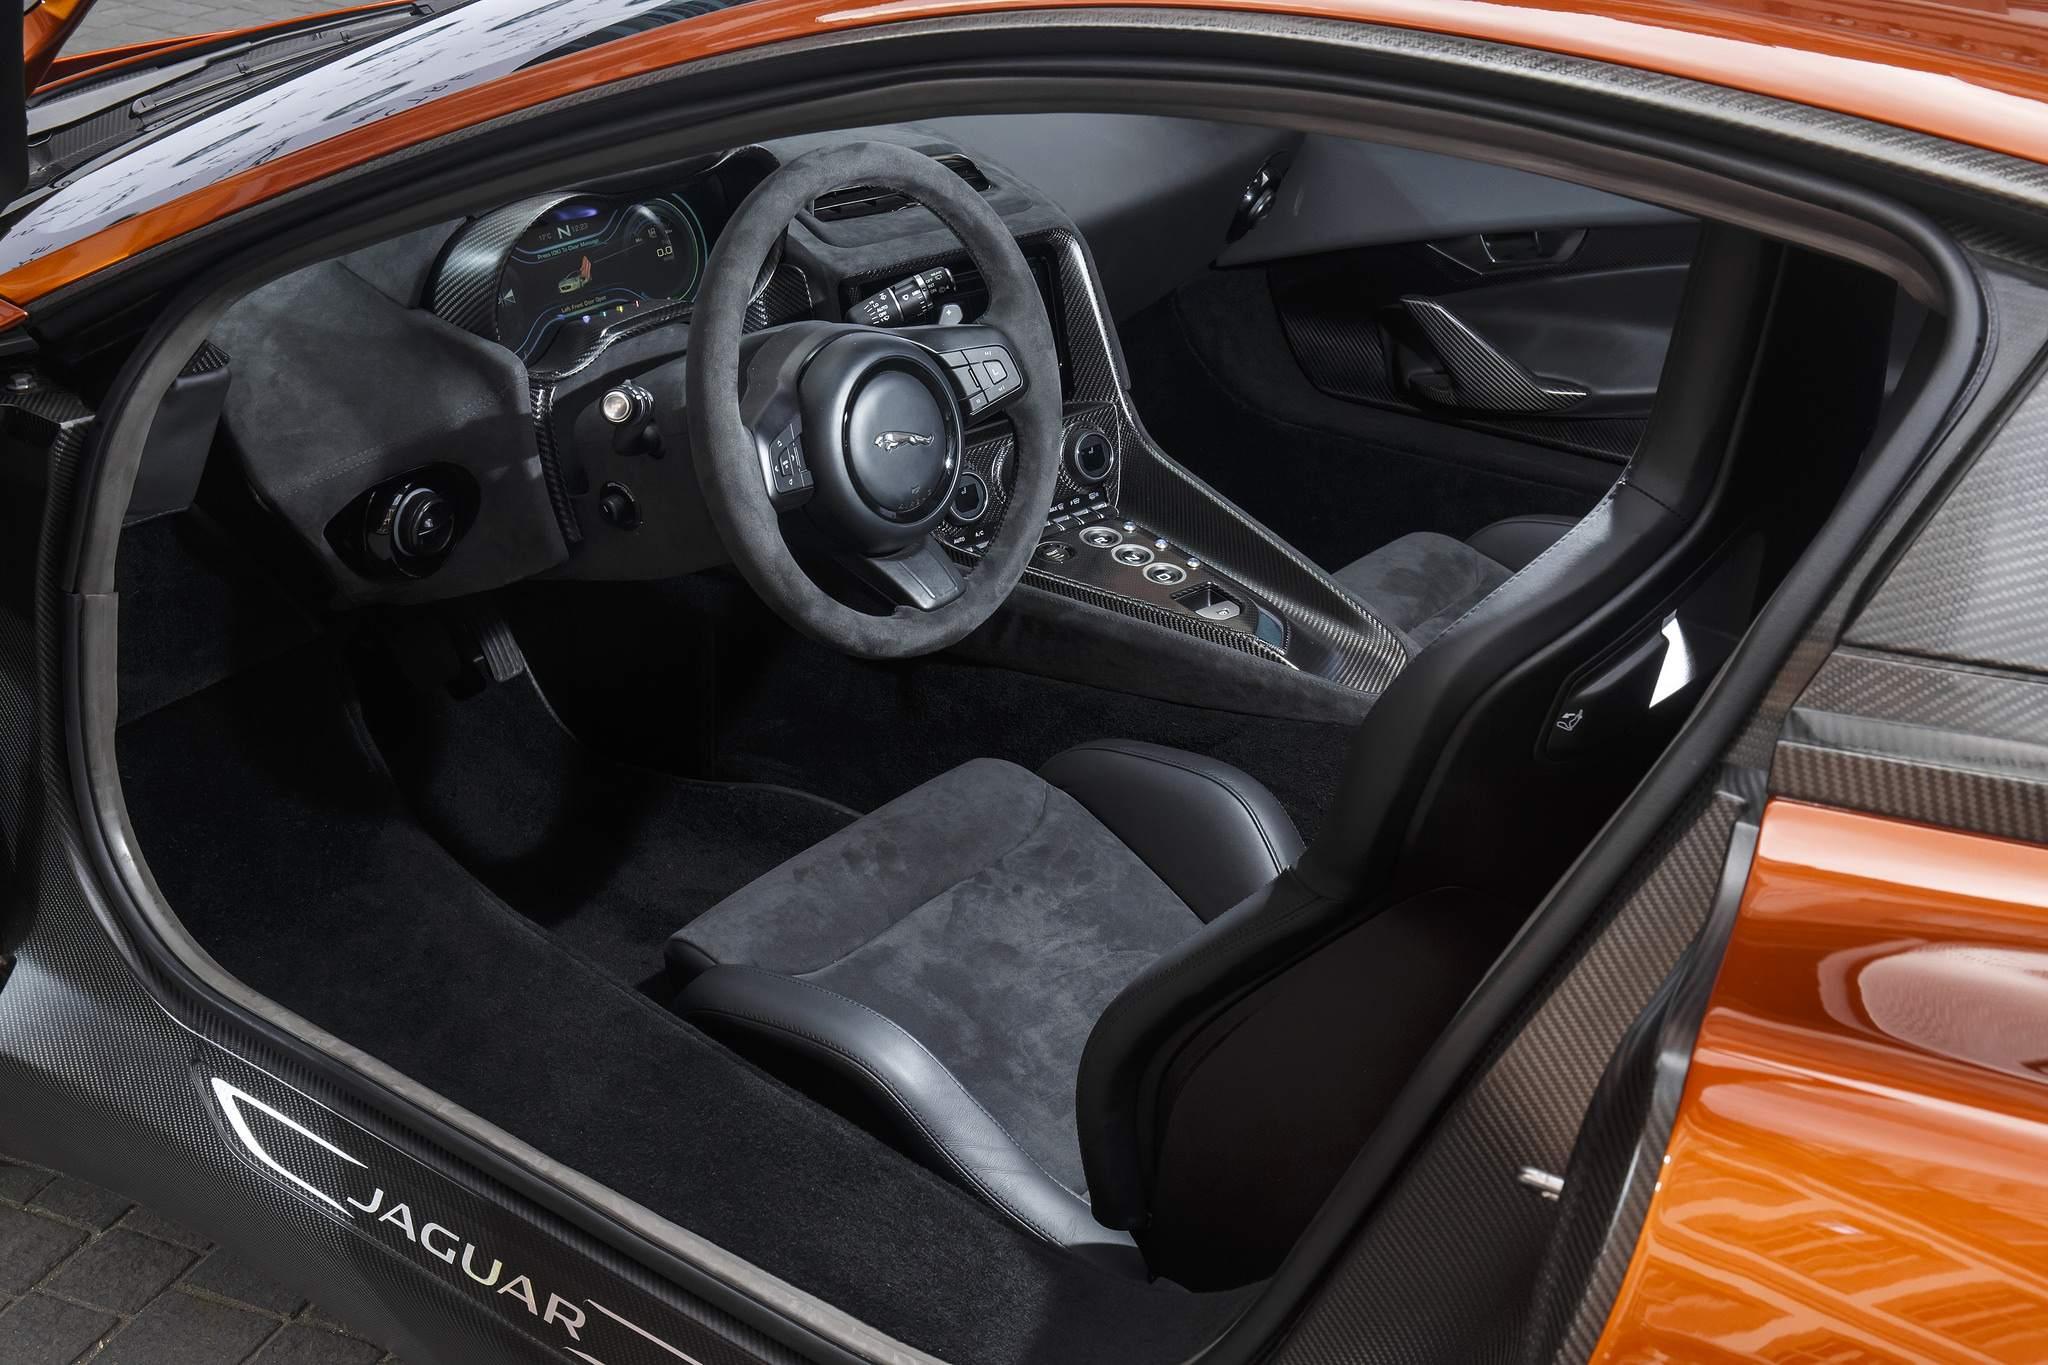 spectre car6 Jaguar Land Rover Latest Bond Cars